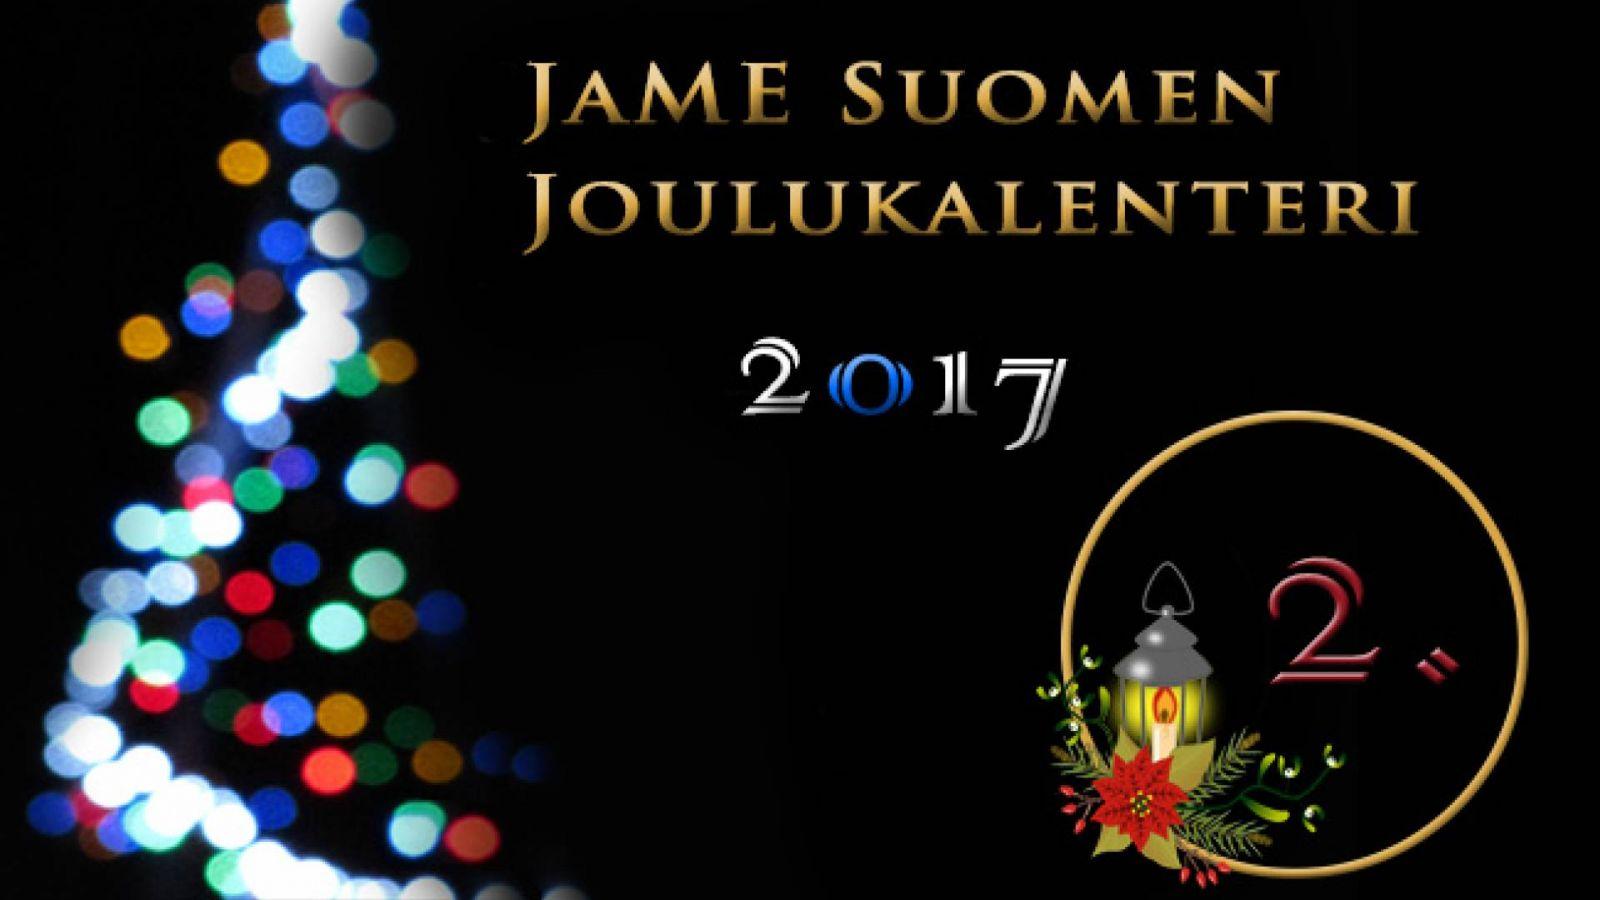 JaME Suomen joulukalenterin 2. luukku © Nipsu